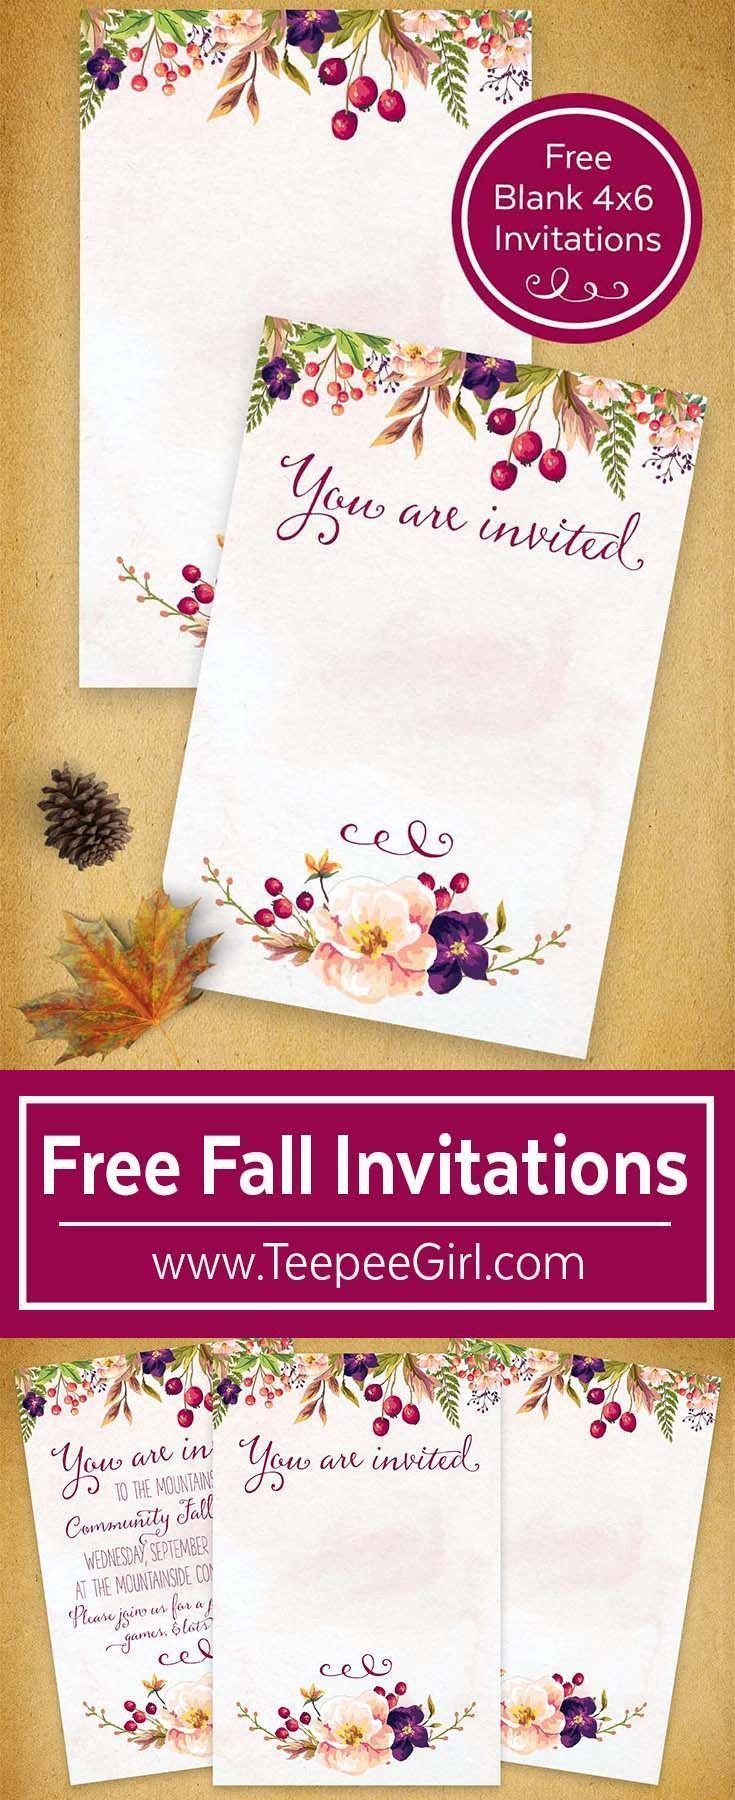 Fall Party Invitations, Free